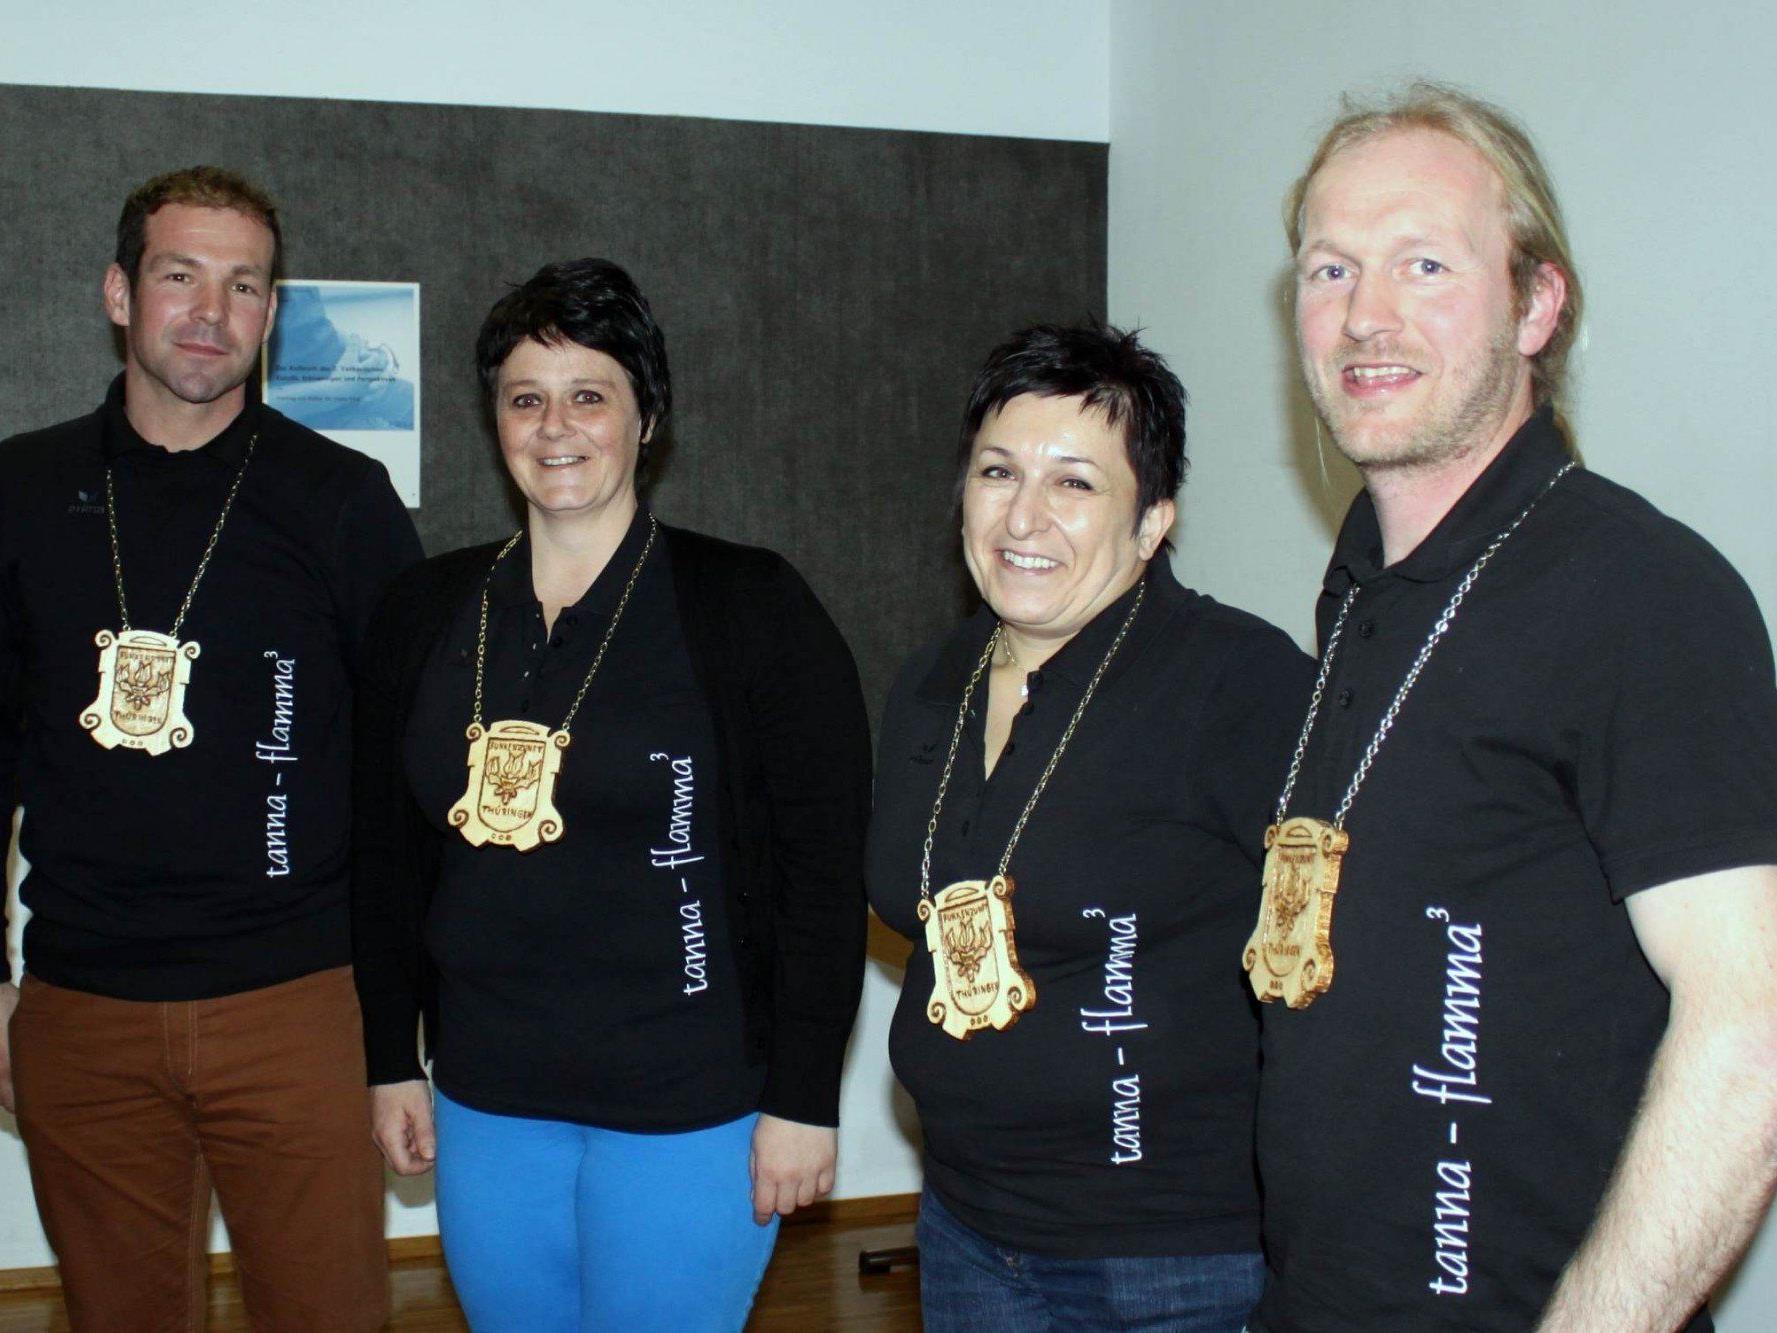 Partnersuche 40 plus in Mhlhausen/Thringen - chad-manufacturing.com